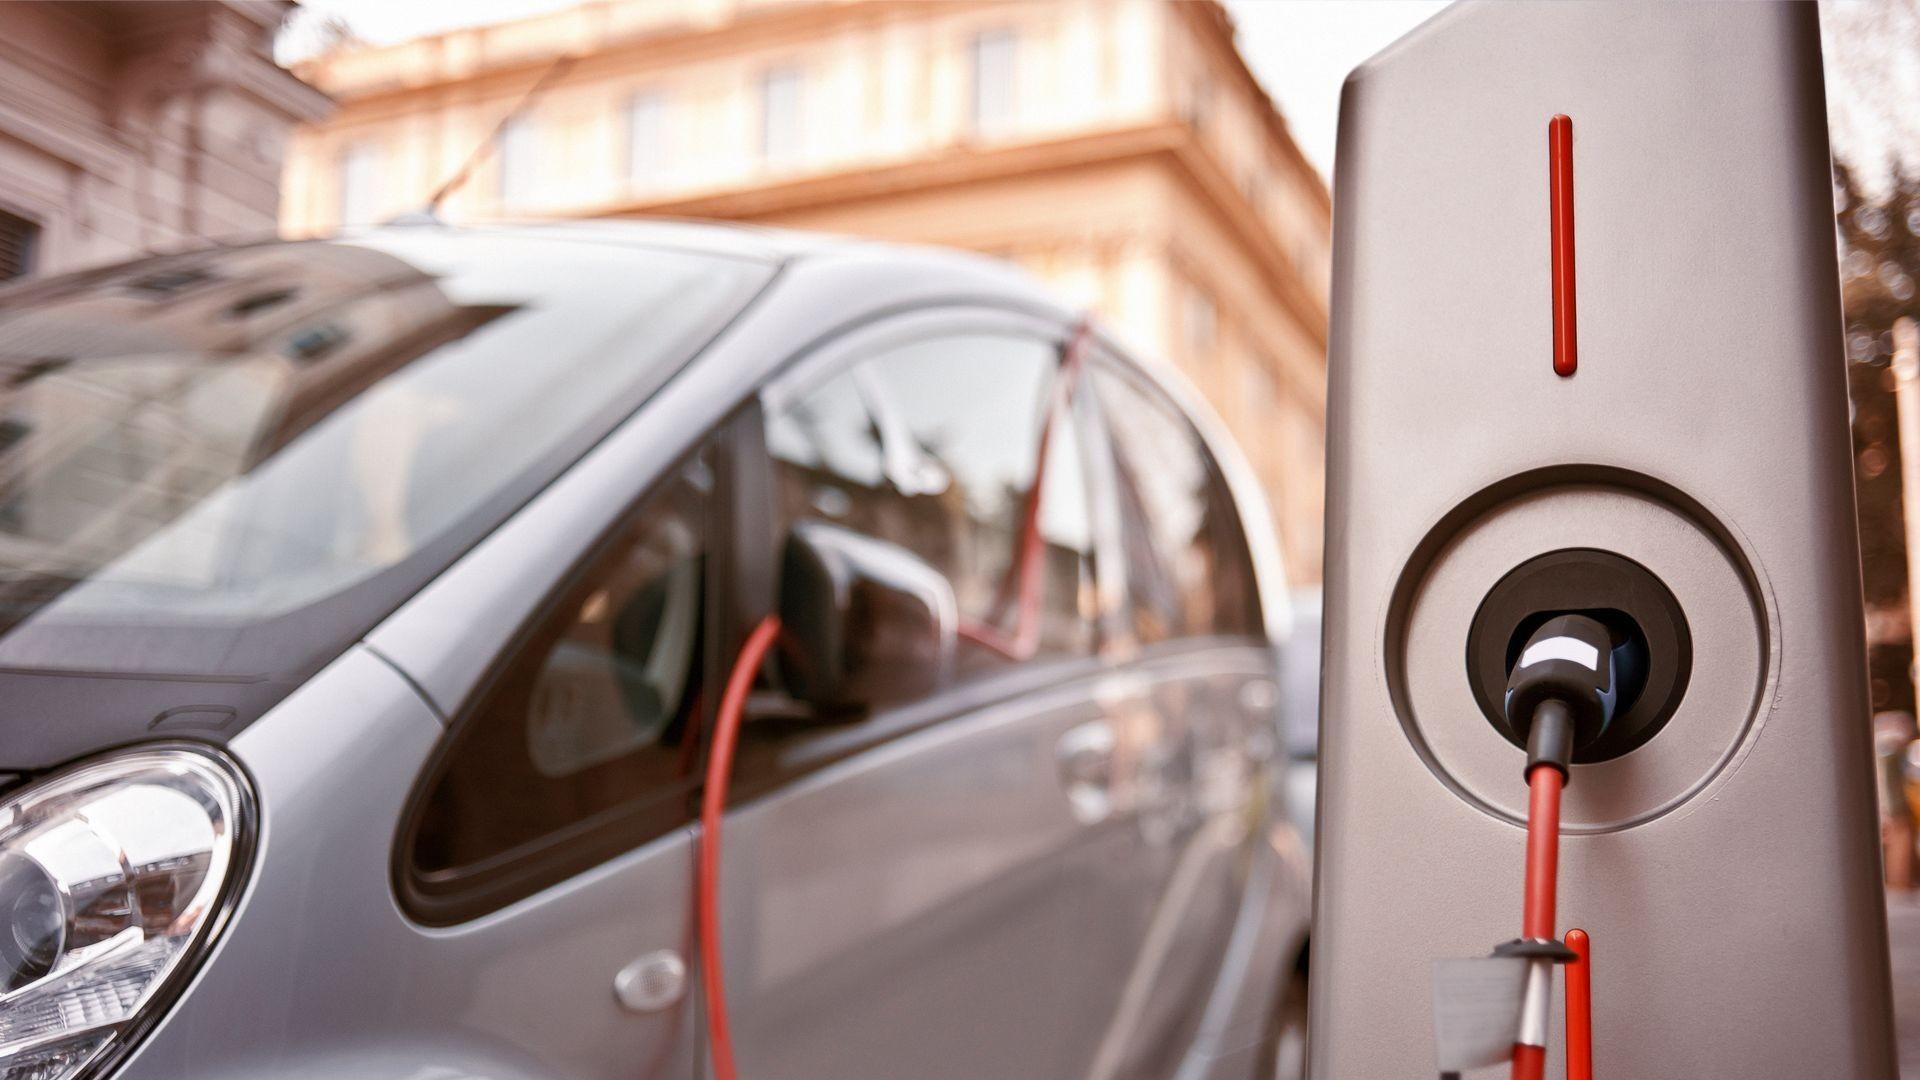 Venta e instalación de puntos de recarga para vehículos eléctricos en Sevilla